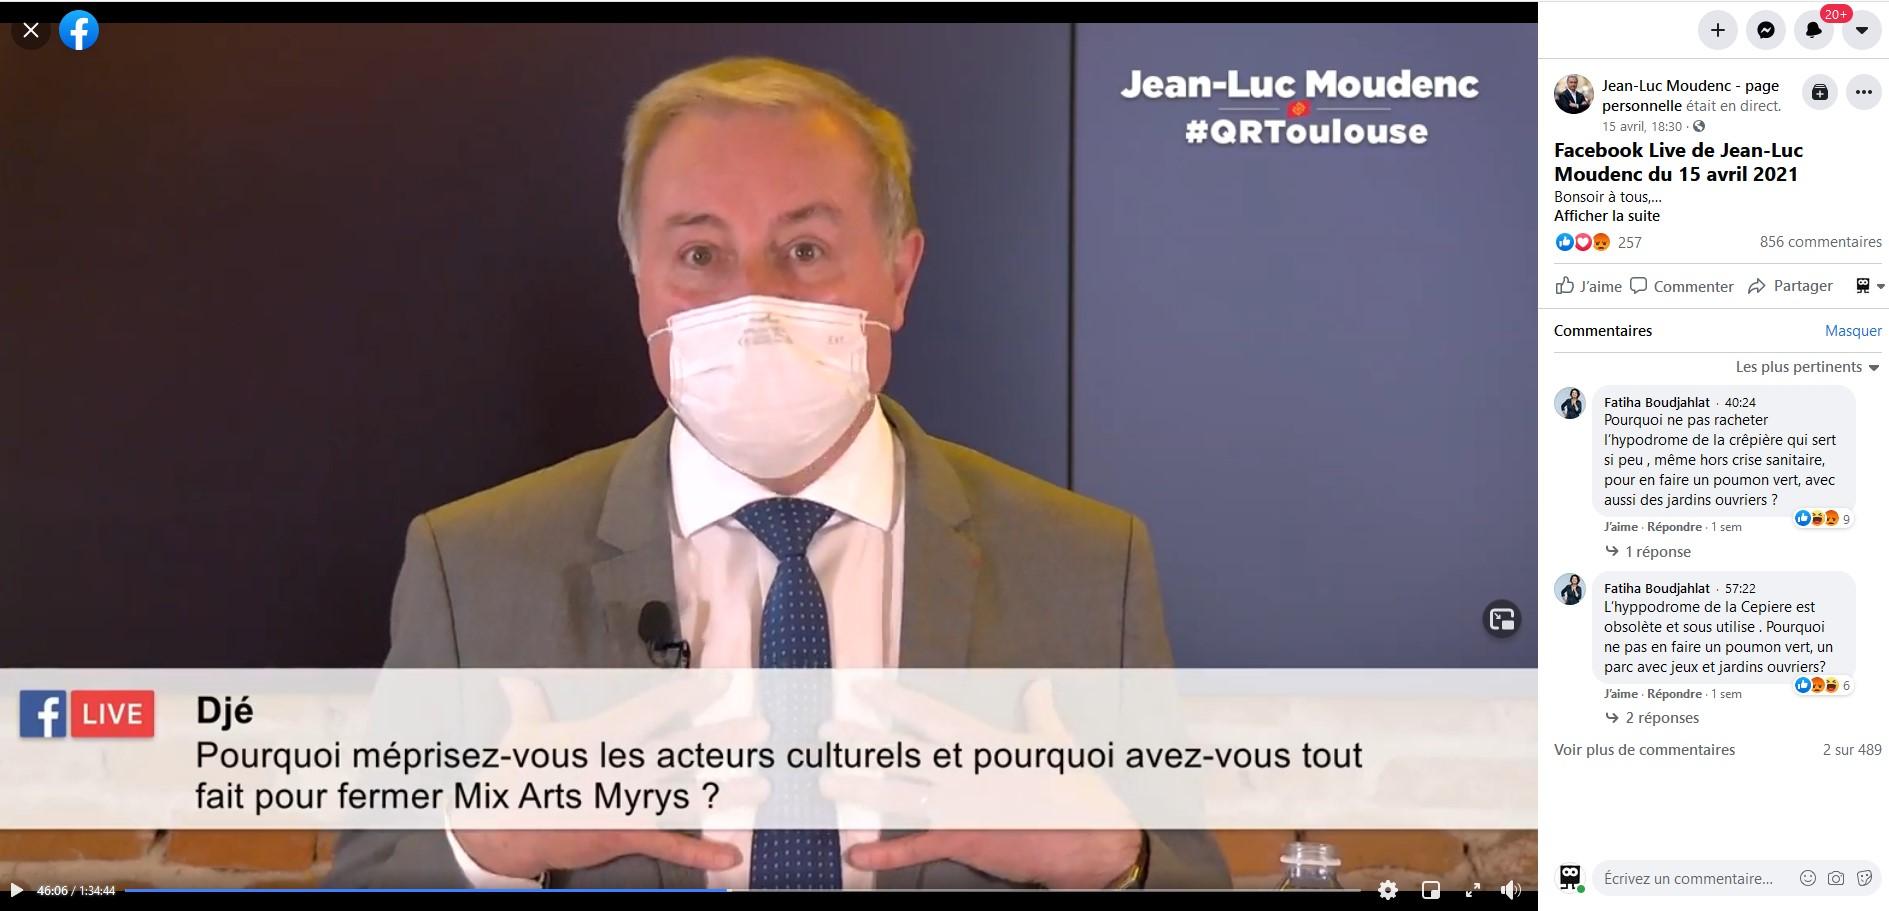 Jean-Luc Moudenc Facebook live